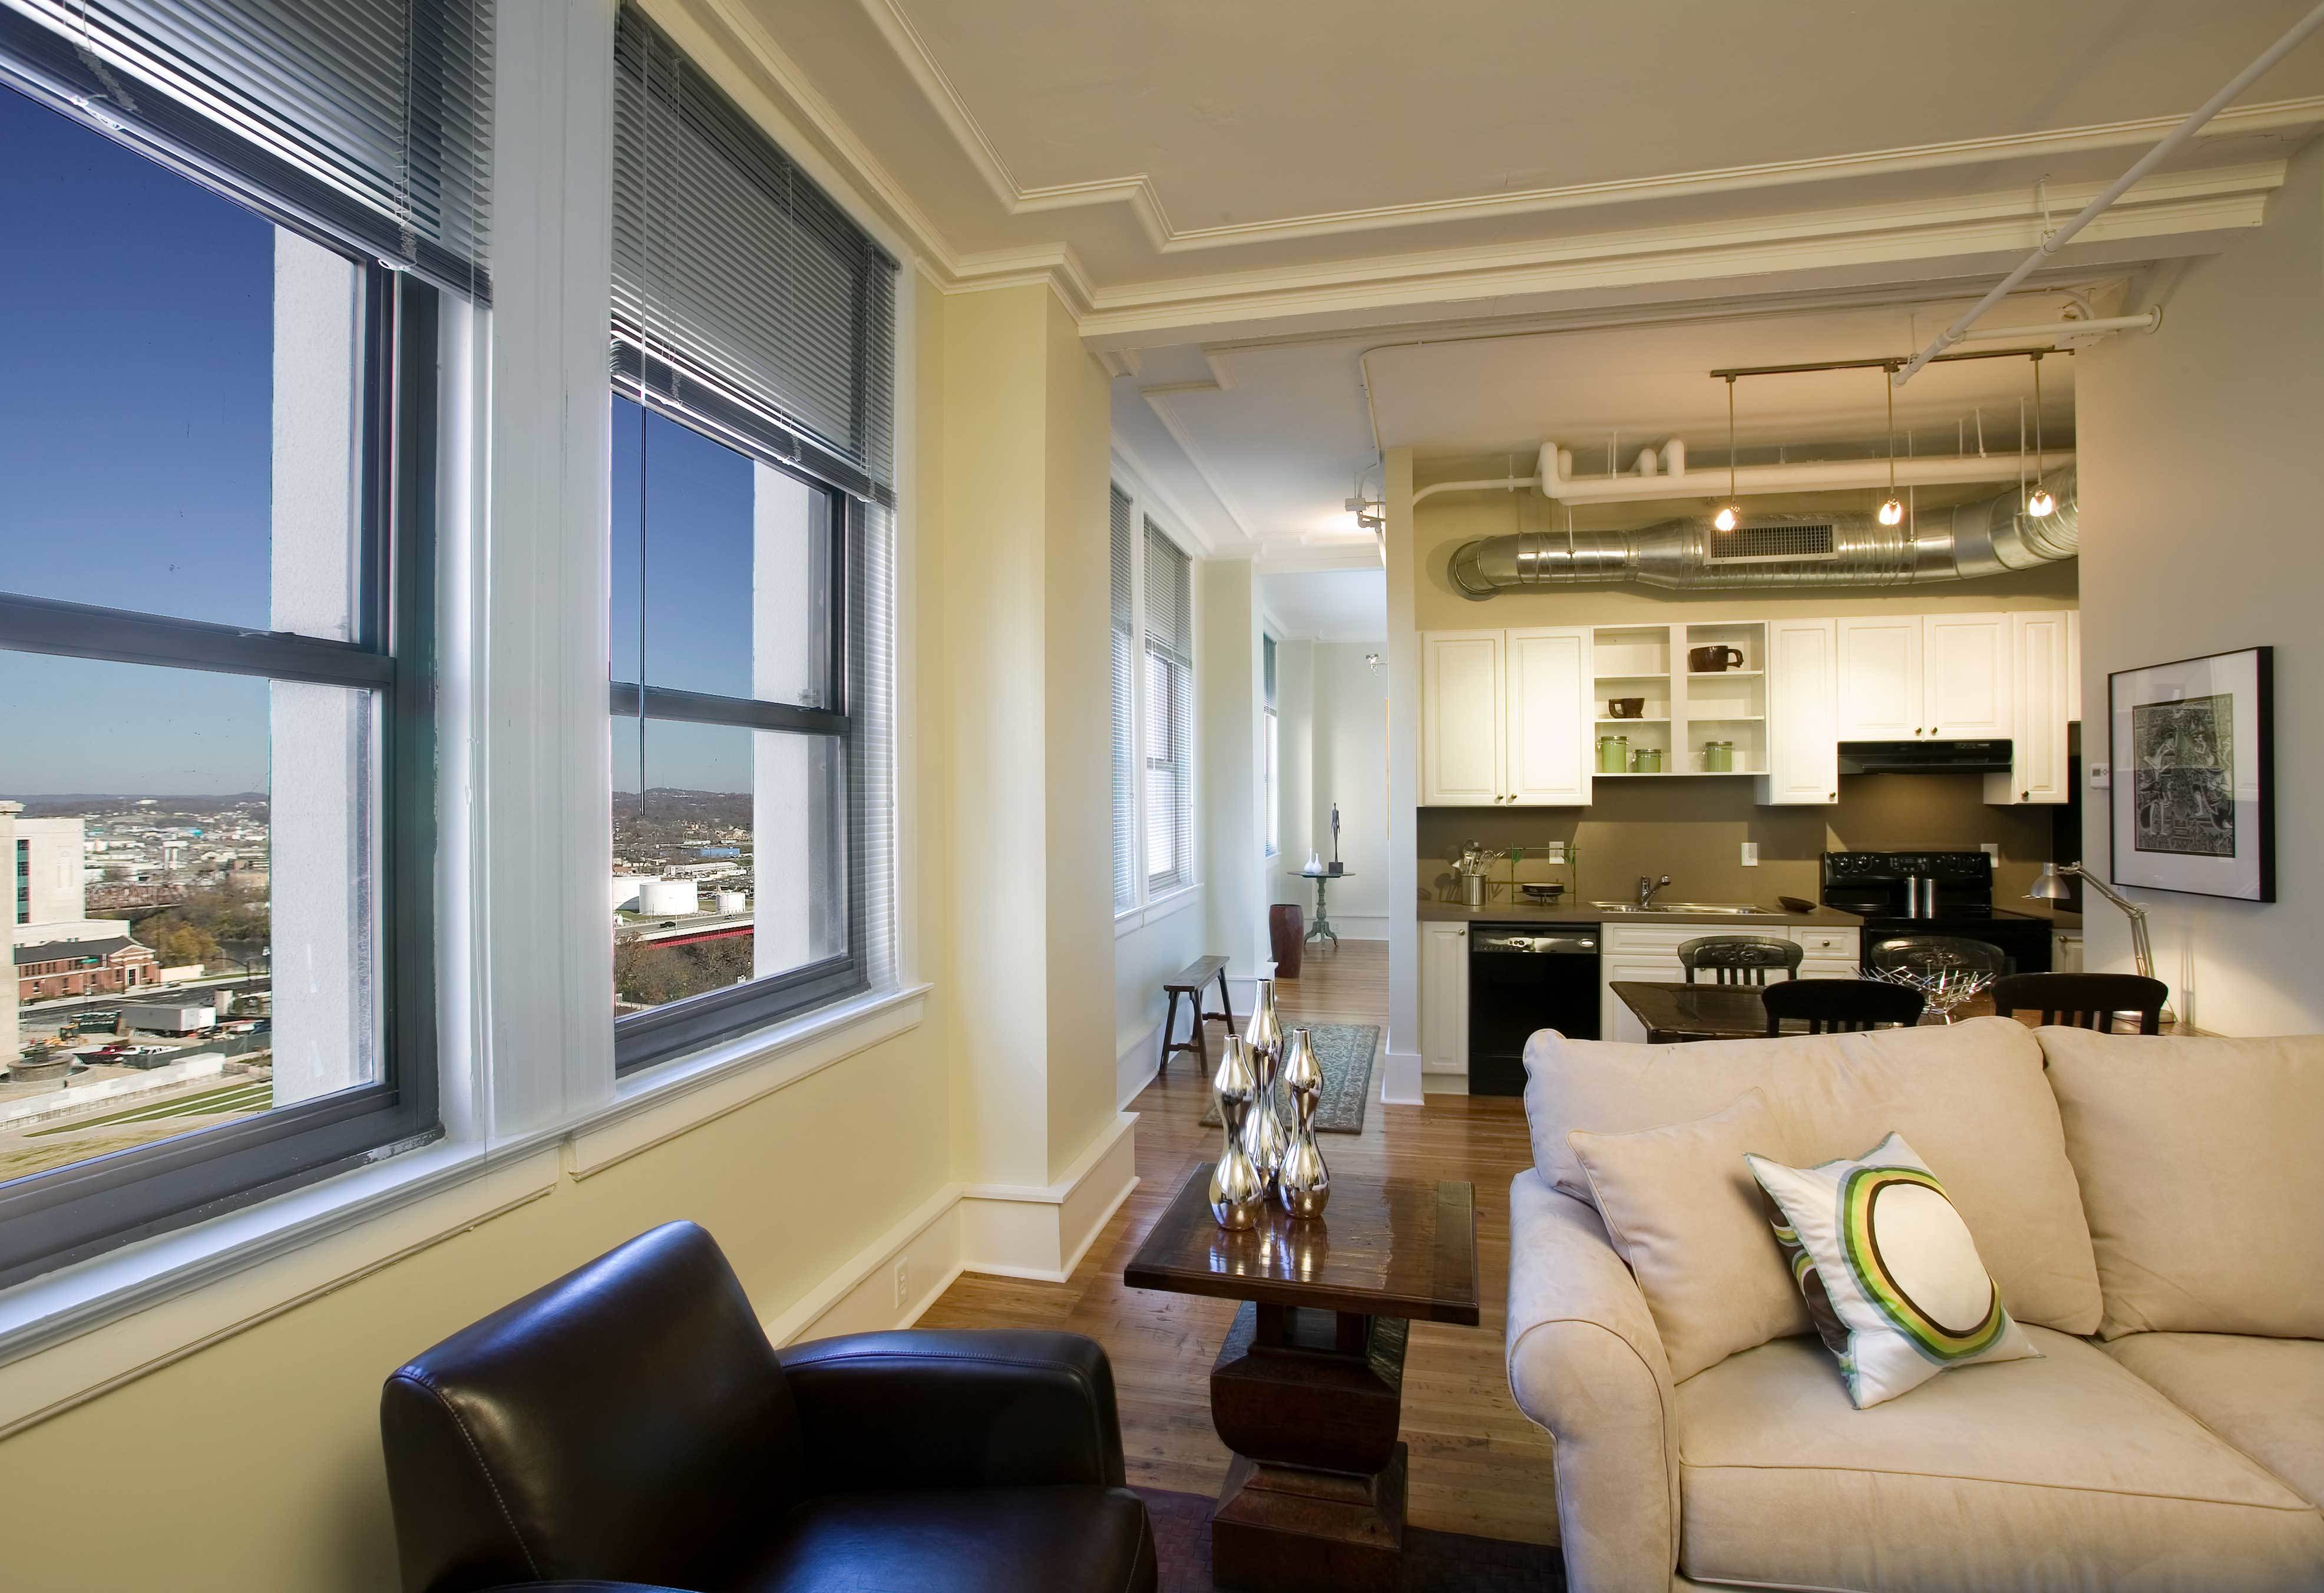 open plan interior living space